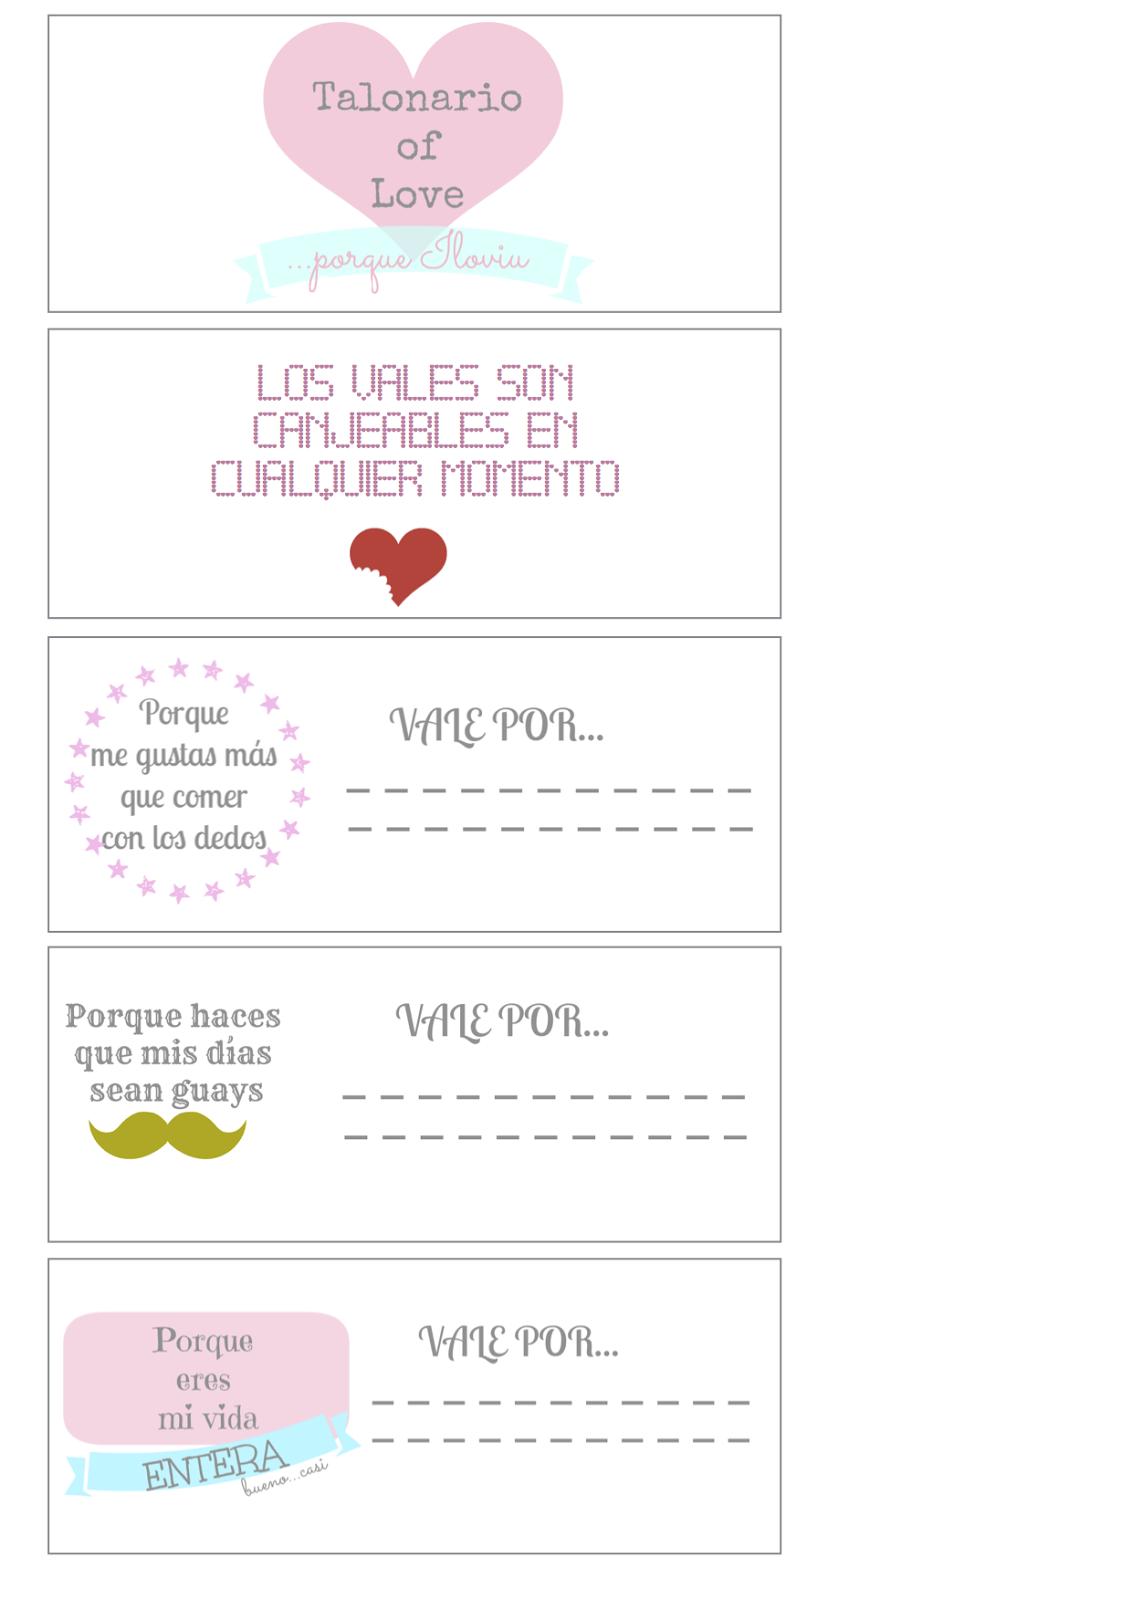 Cupones Dia De San Valentin Ideas Del Dia De San Valentin Cupones Para Novio Cupones Imprimibles Vales Para Parejas